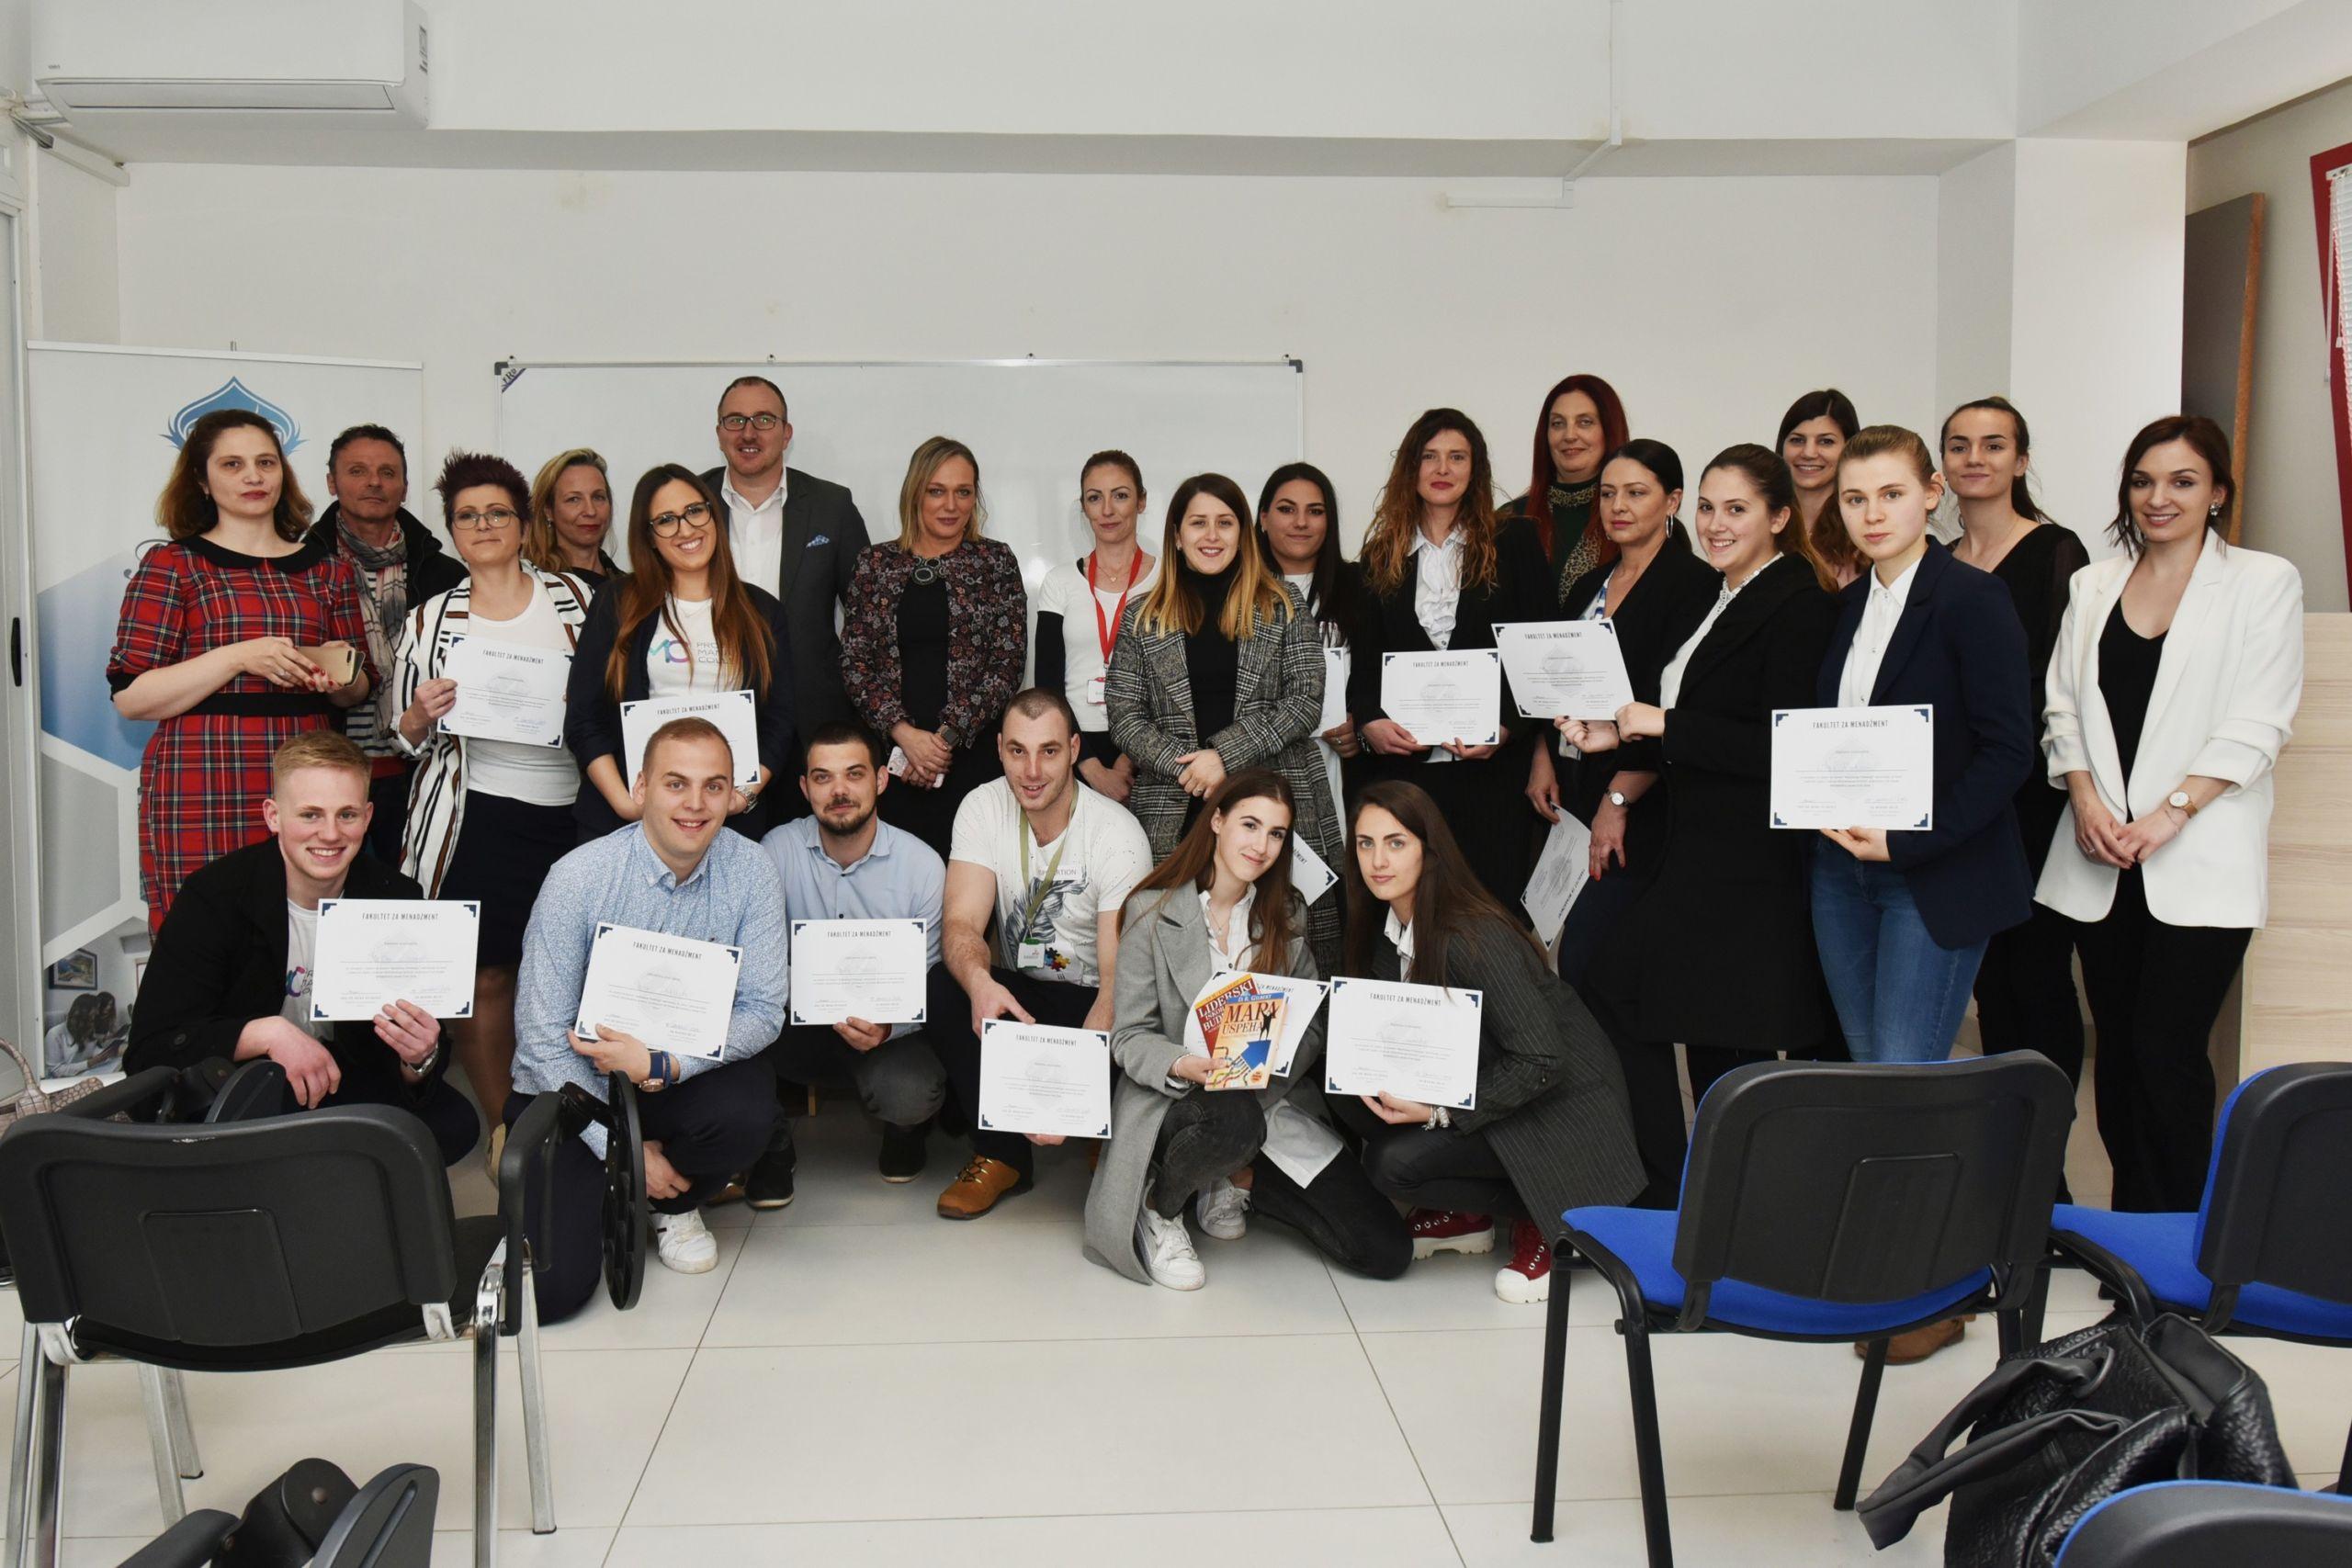 Media Centar Fakultet Za Menadzment Herceg Novi